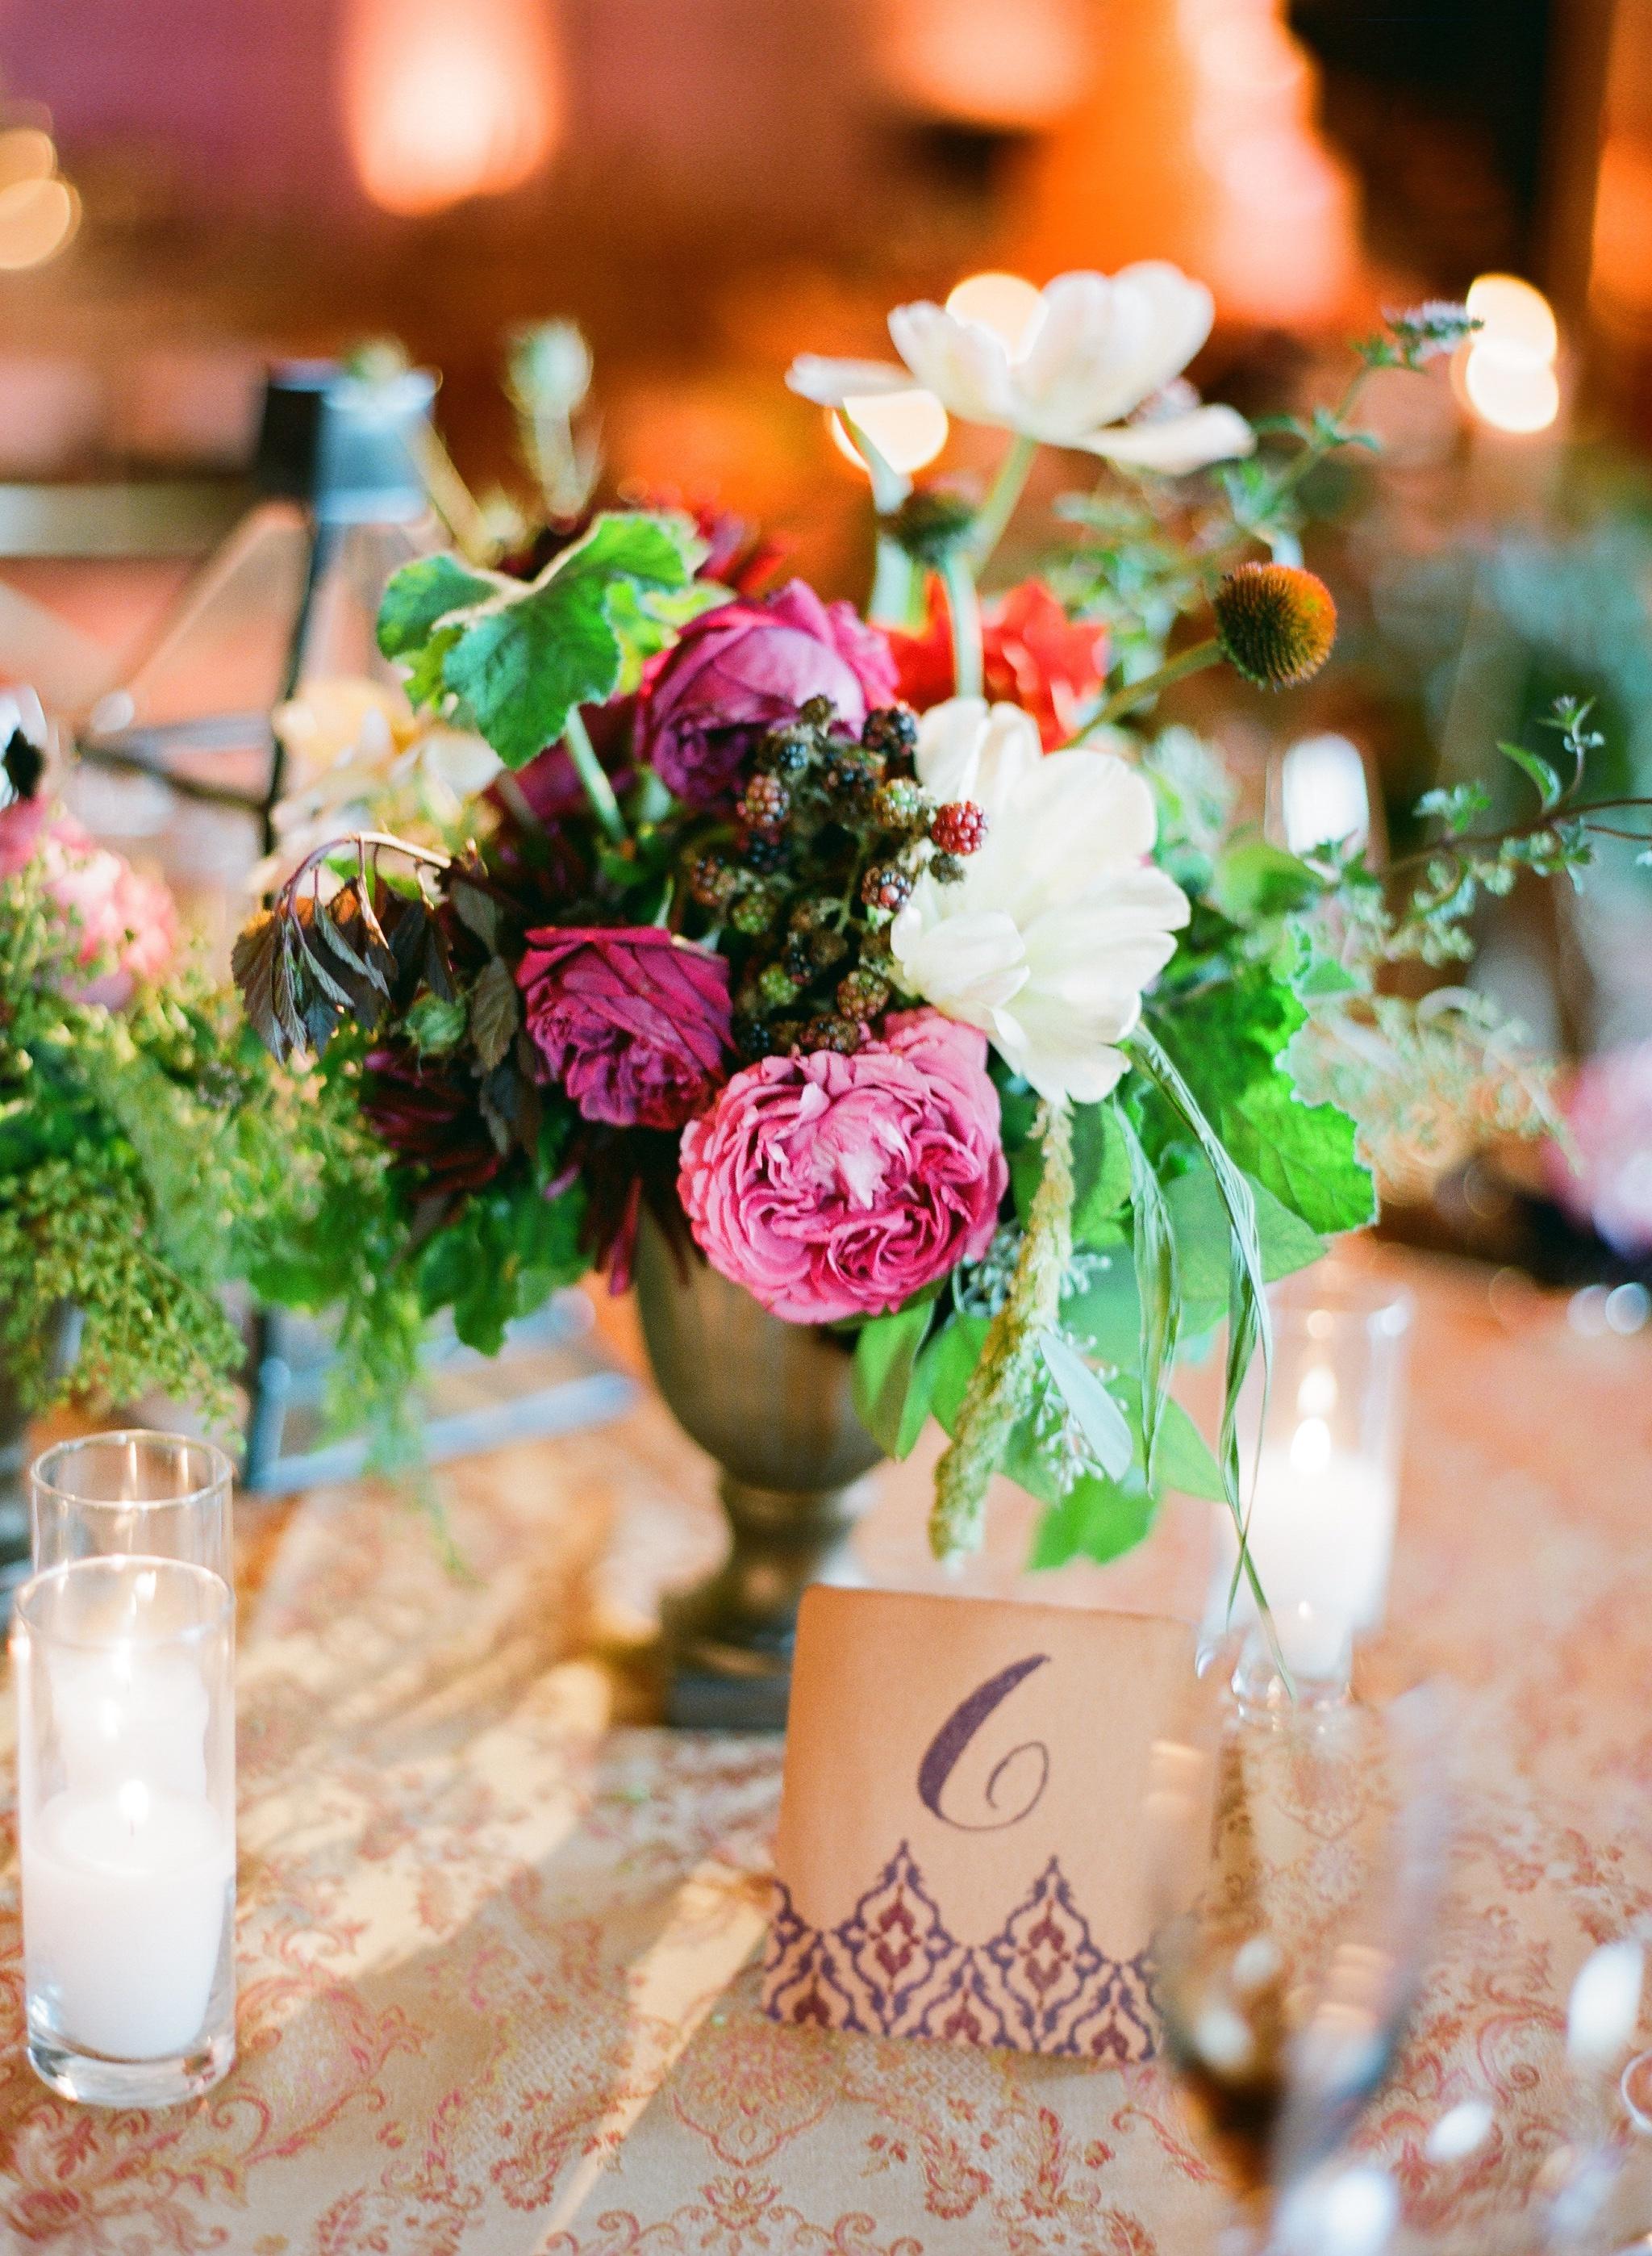 magnoliaeventdesign.com | Jose Villa | Wedding at The Four Seasons Biltmore in Santa Barbara | Magnolia Event Design